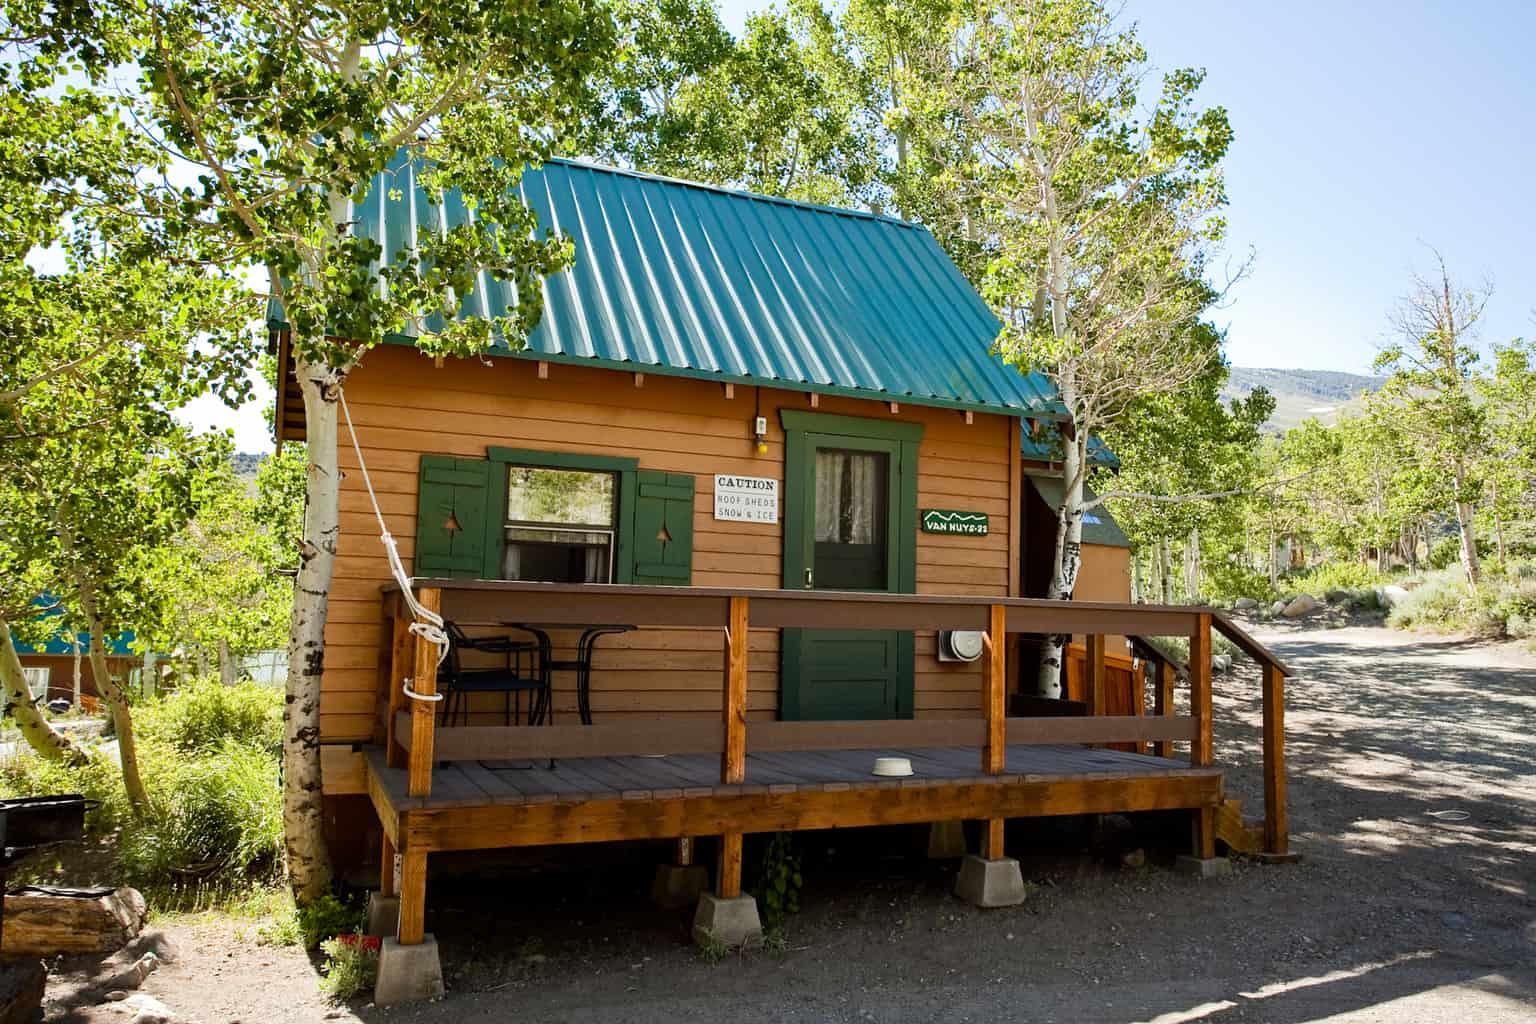 Van Nuys 22 Convict Lake Resort